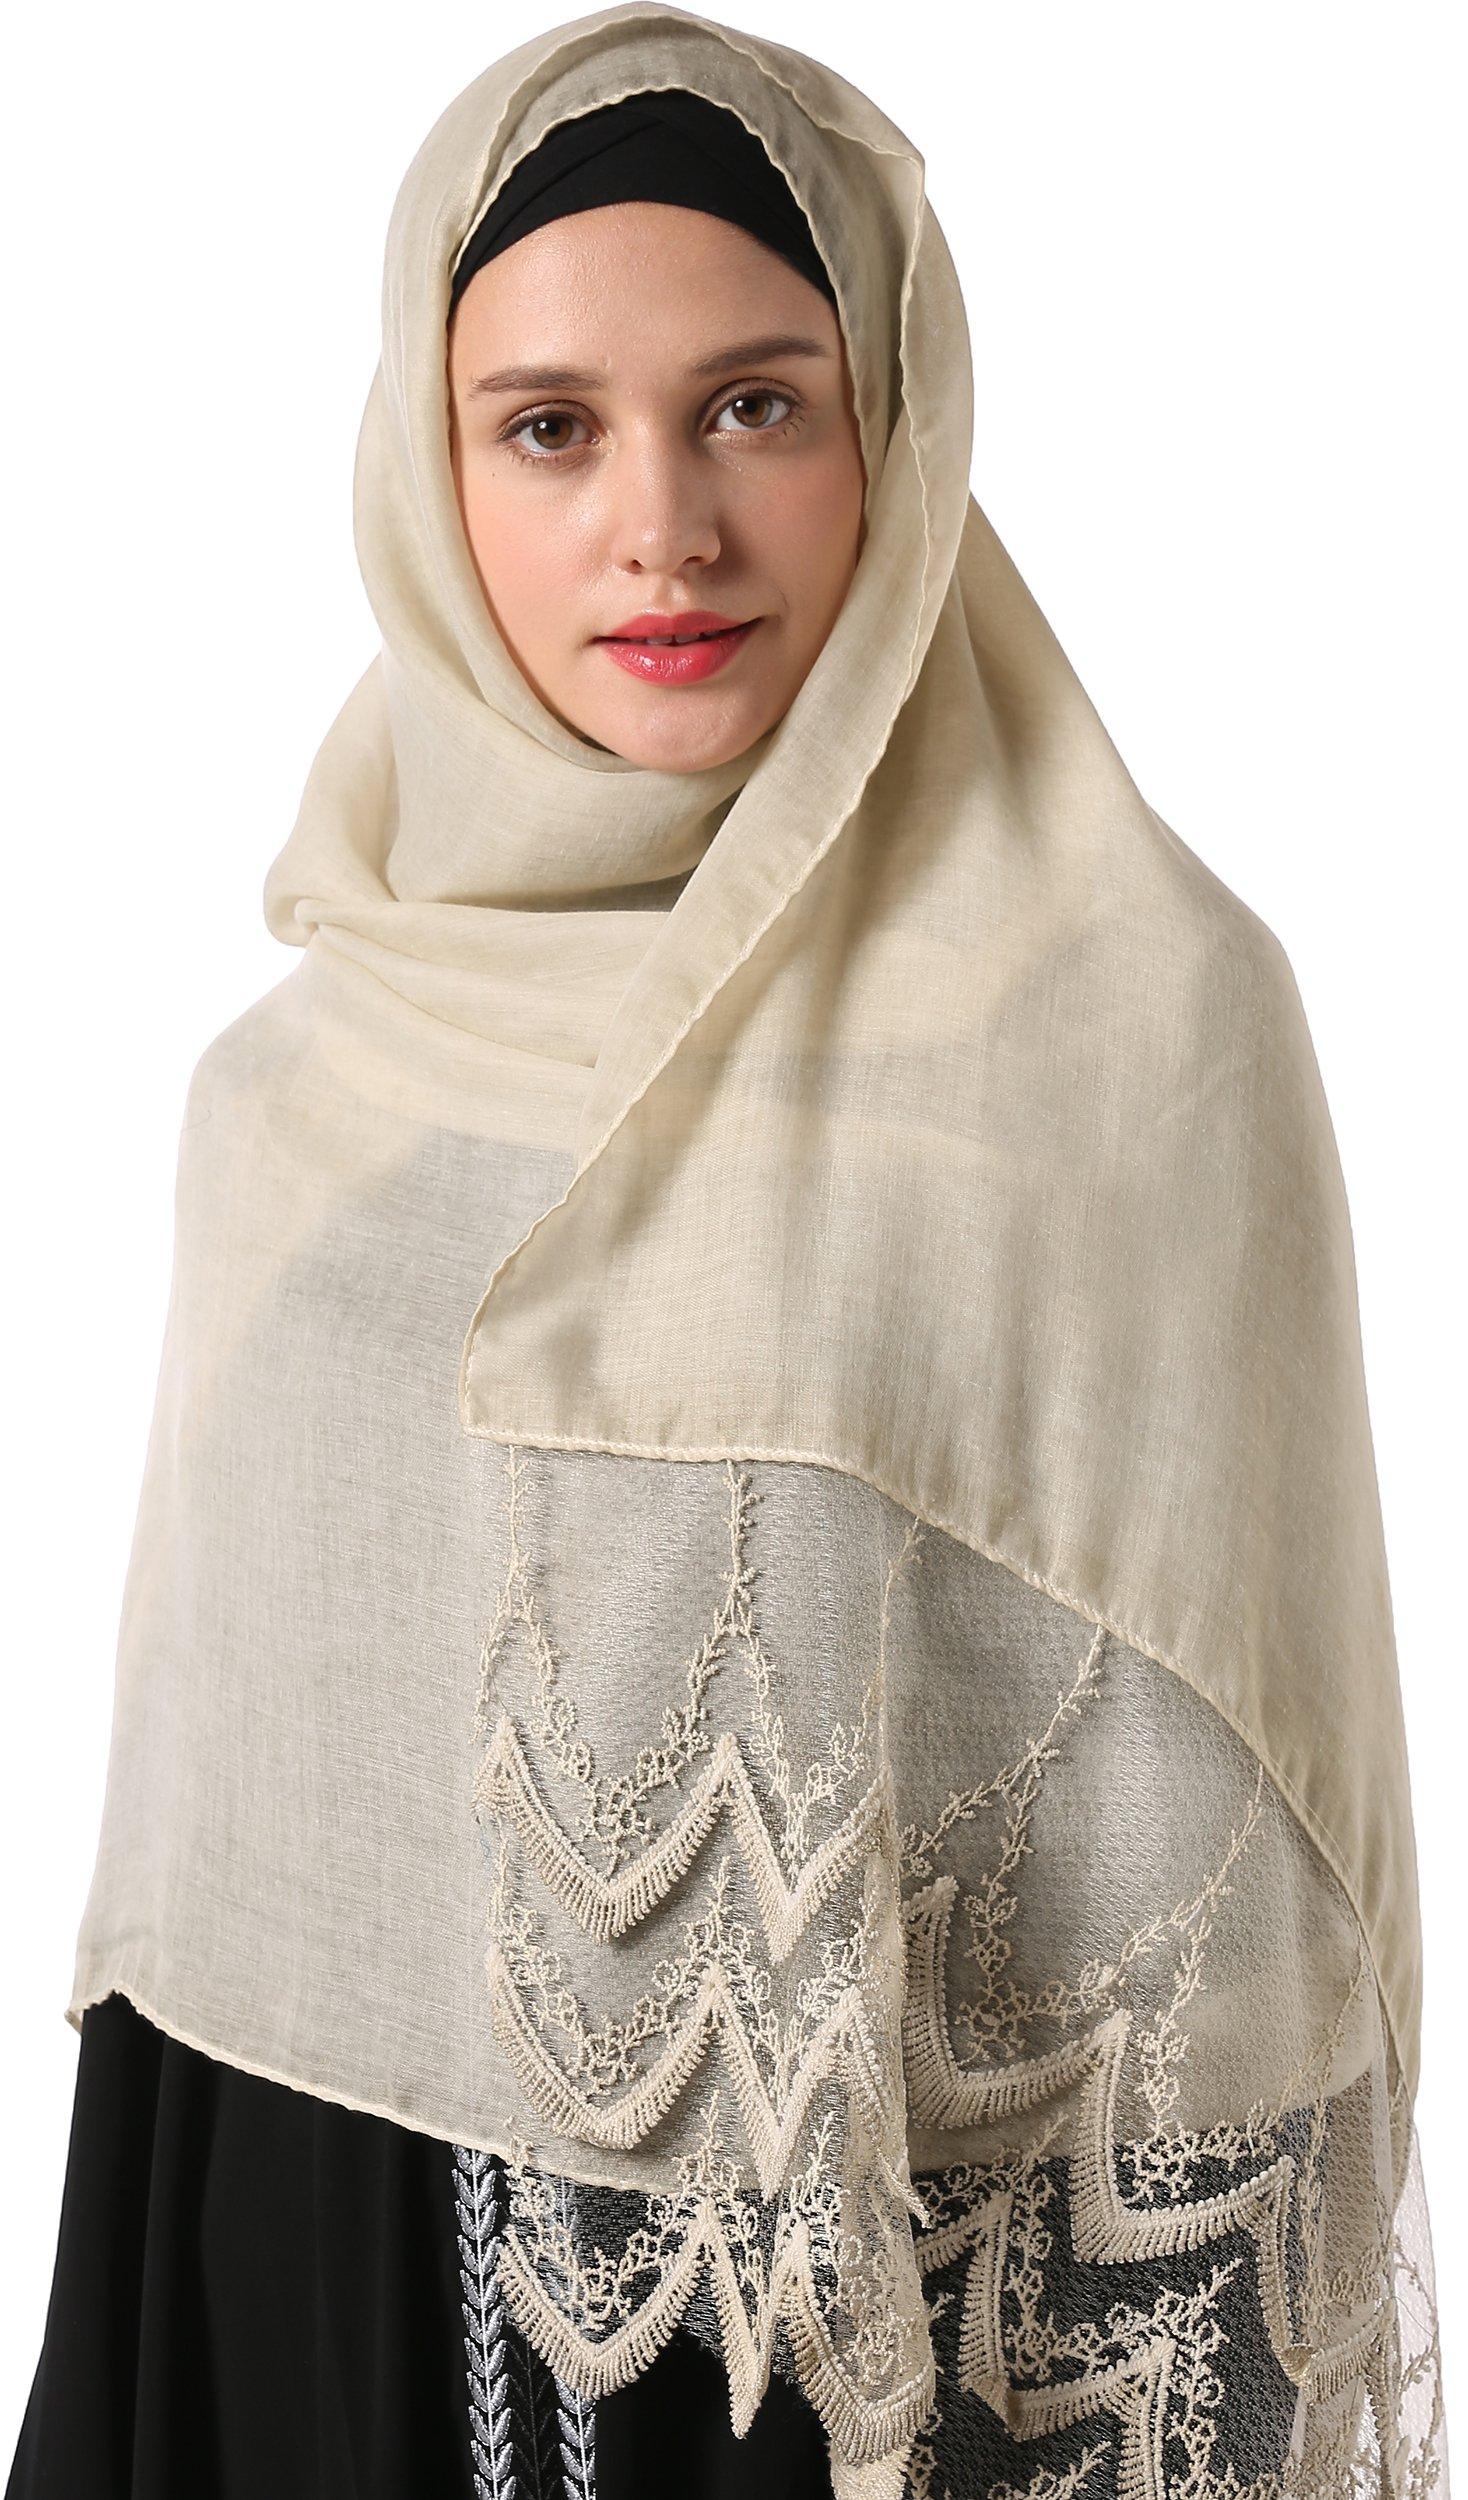 Ababalaya Women's Modest Muslim Islamic Soft Breathable Lace Headscarf Wedding Hijab 78×35 inch,Beige